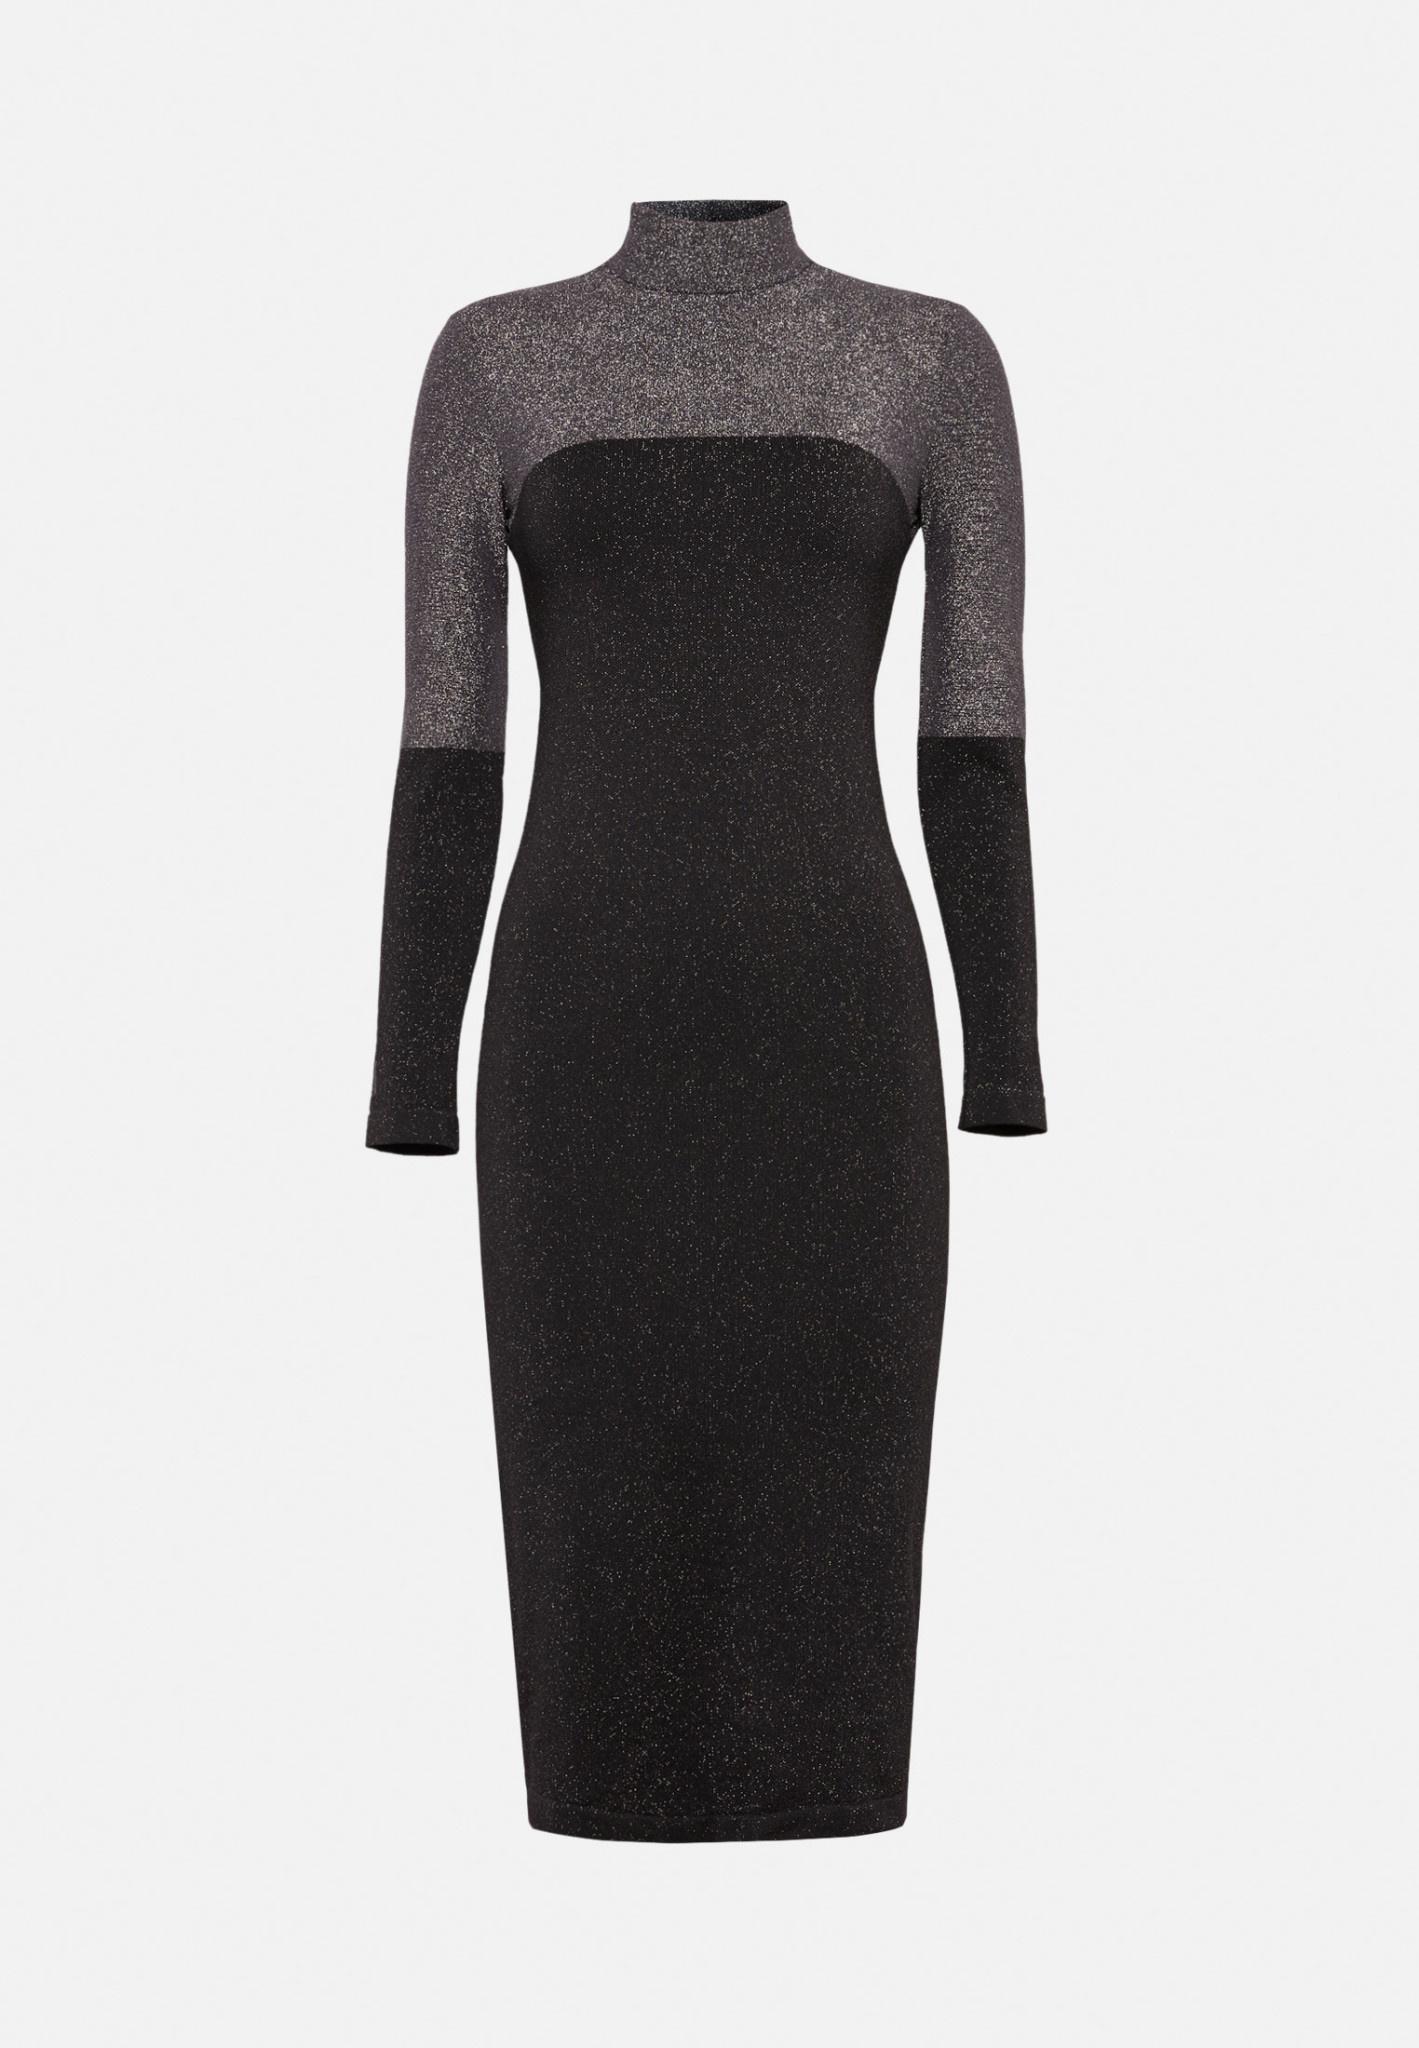 WOLFORD 57142 Selene Dress